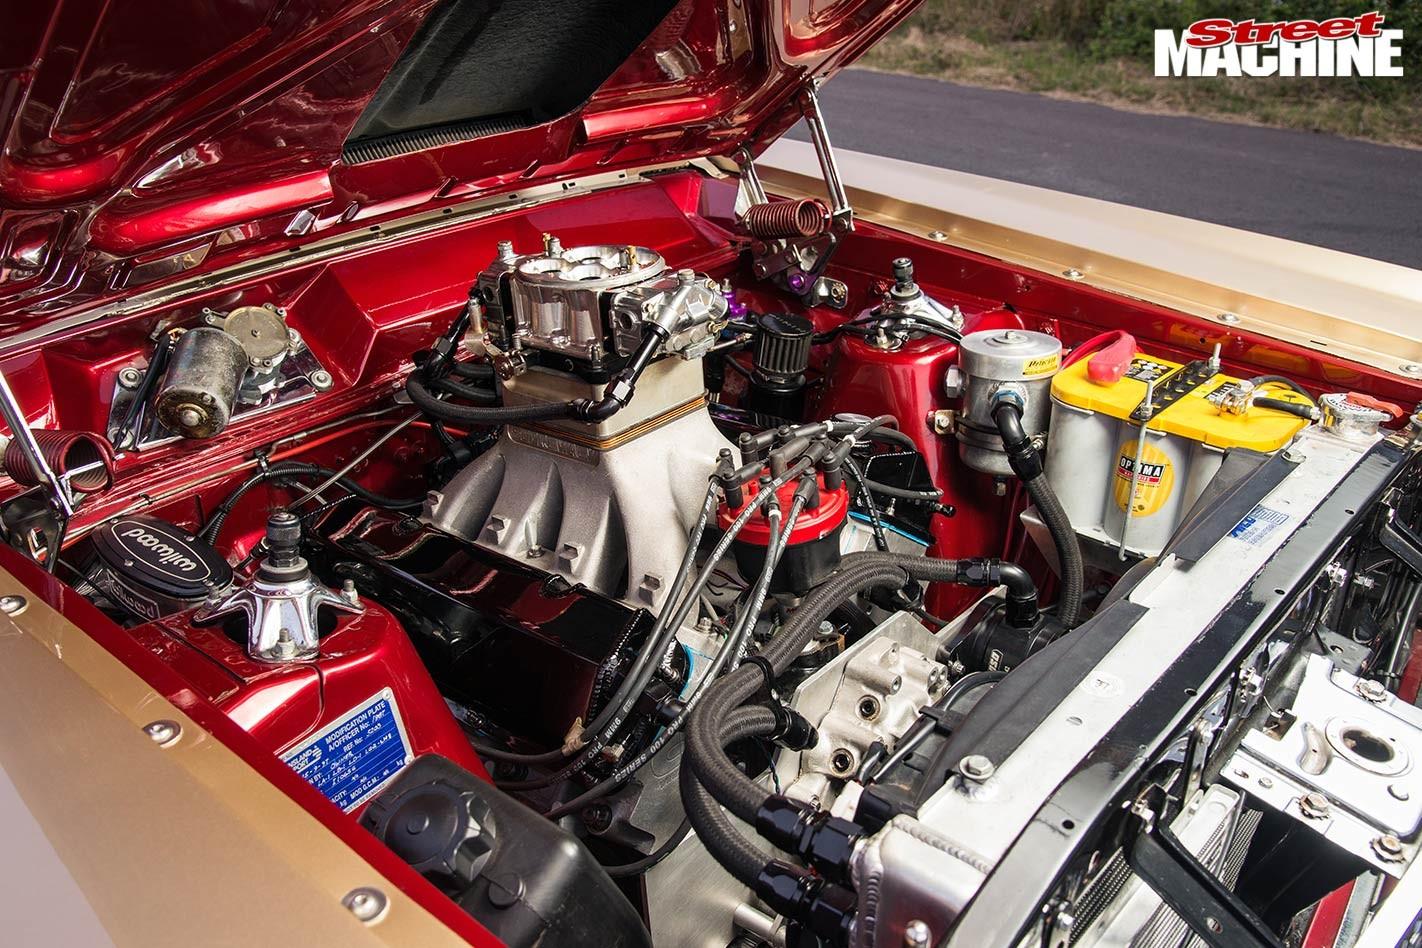 Ford XR Fairmont engine bay